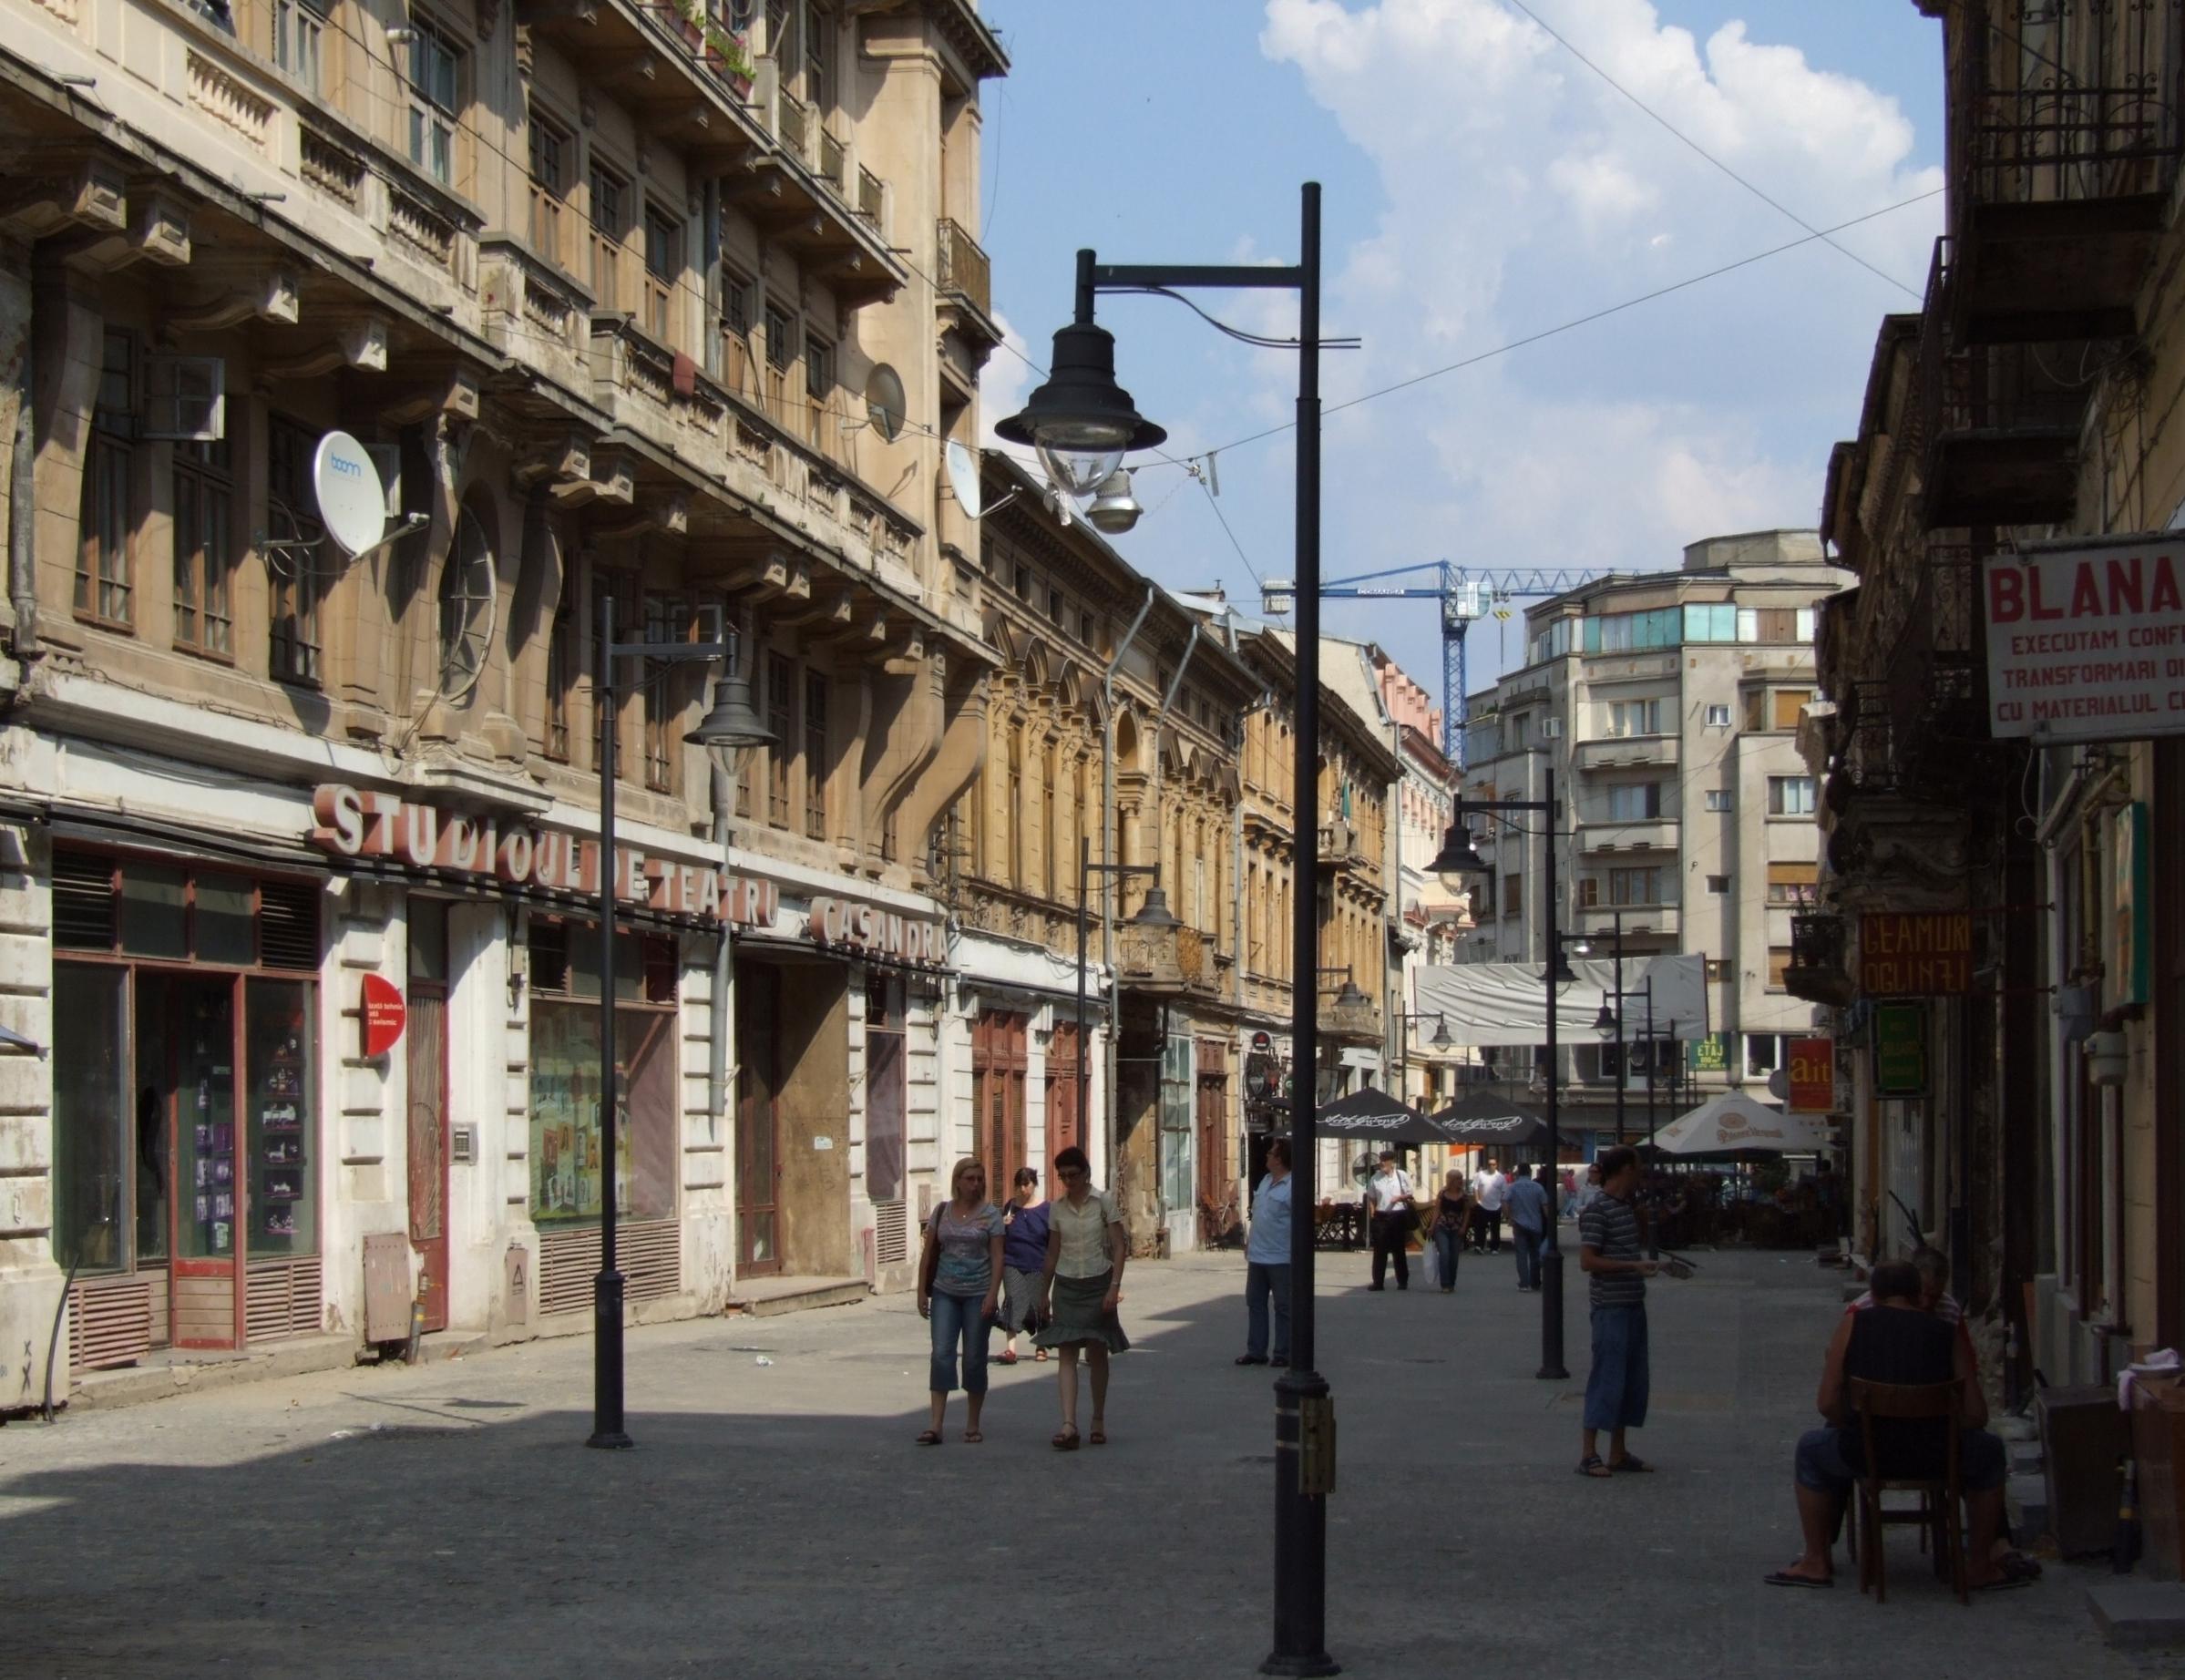 File:Bucharest - old city.jpg - Wikimedia Commons